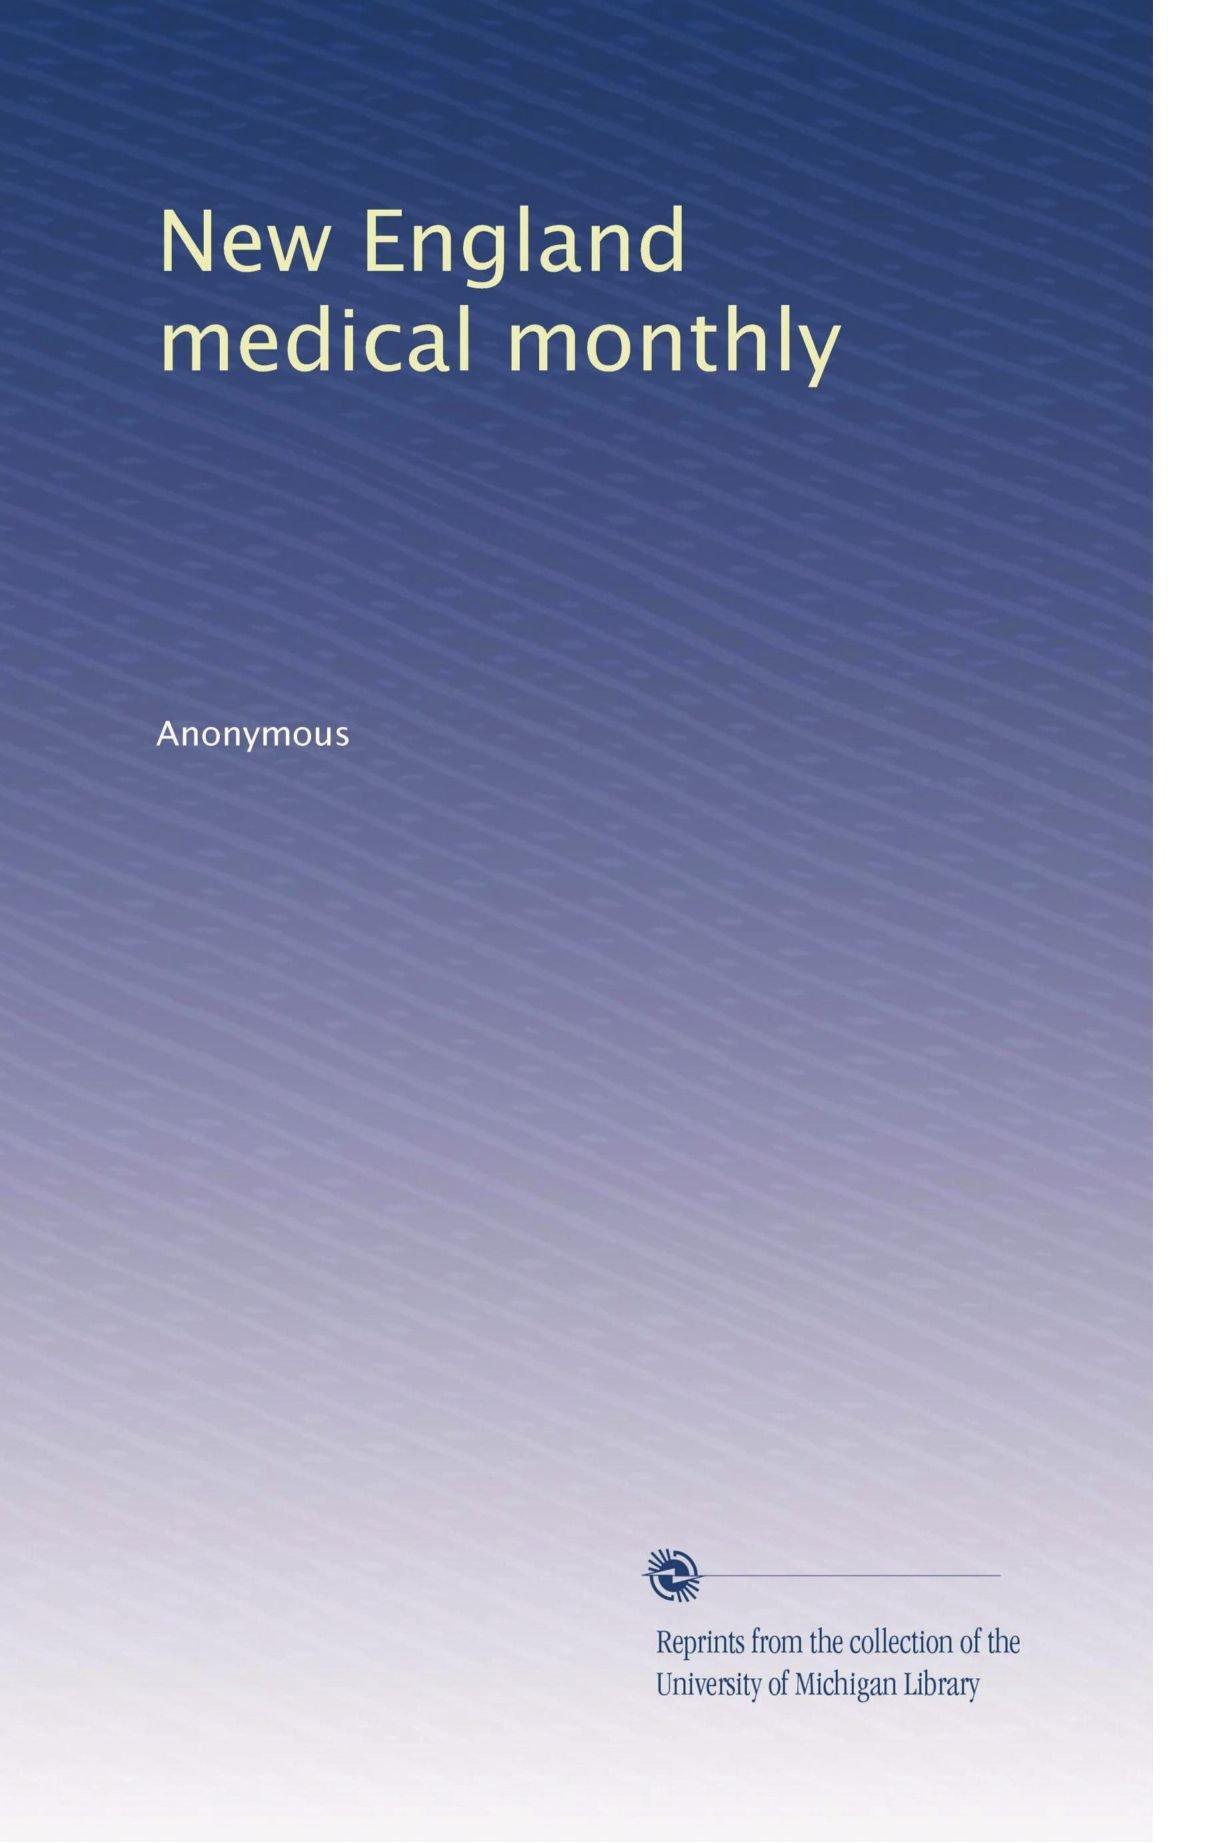 New England medical monthly (Volume 31) pdf